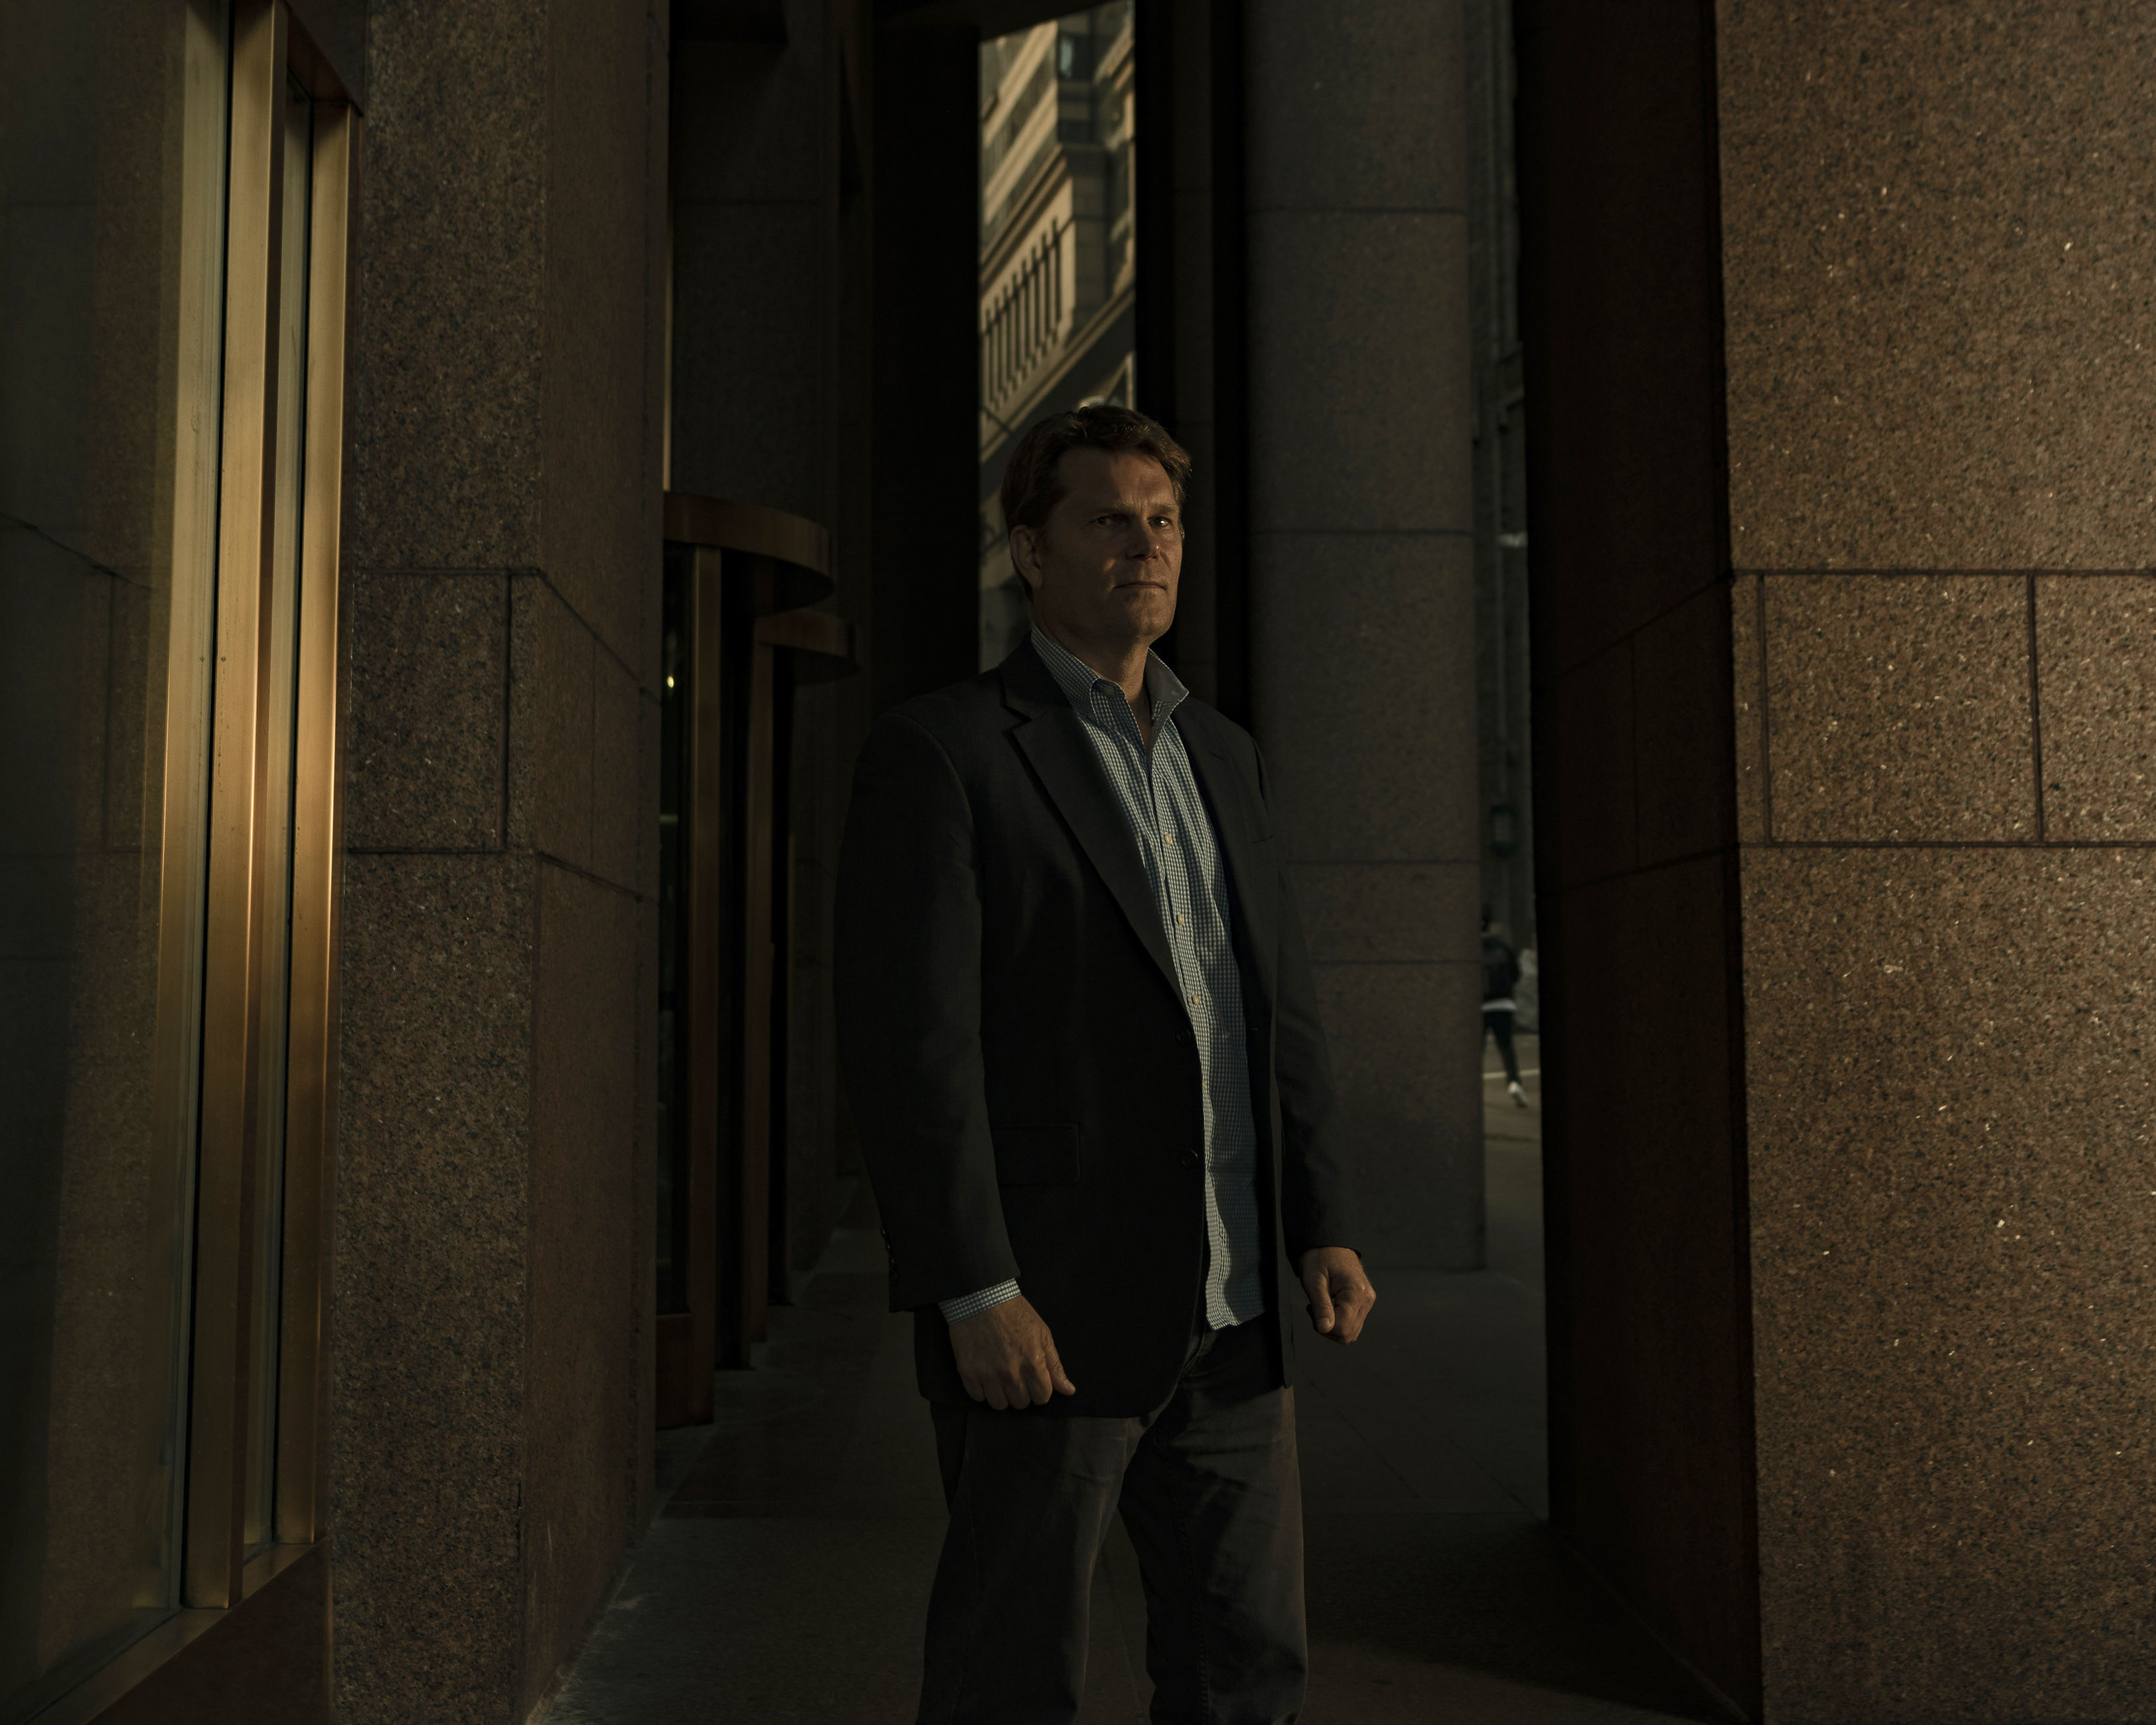 Former FBI agent and Michael German photographed near Wall Street downtown Manhattan on September 13, 2019. Sasha Maslov for the Intercept